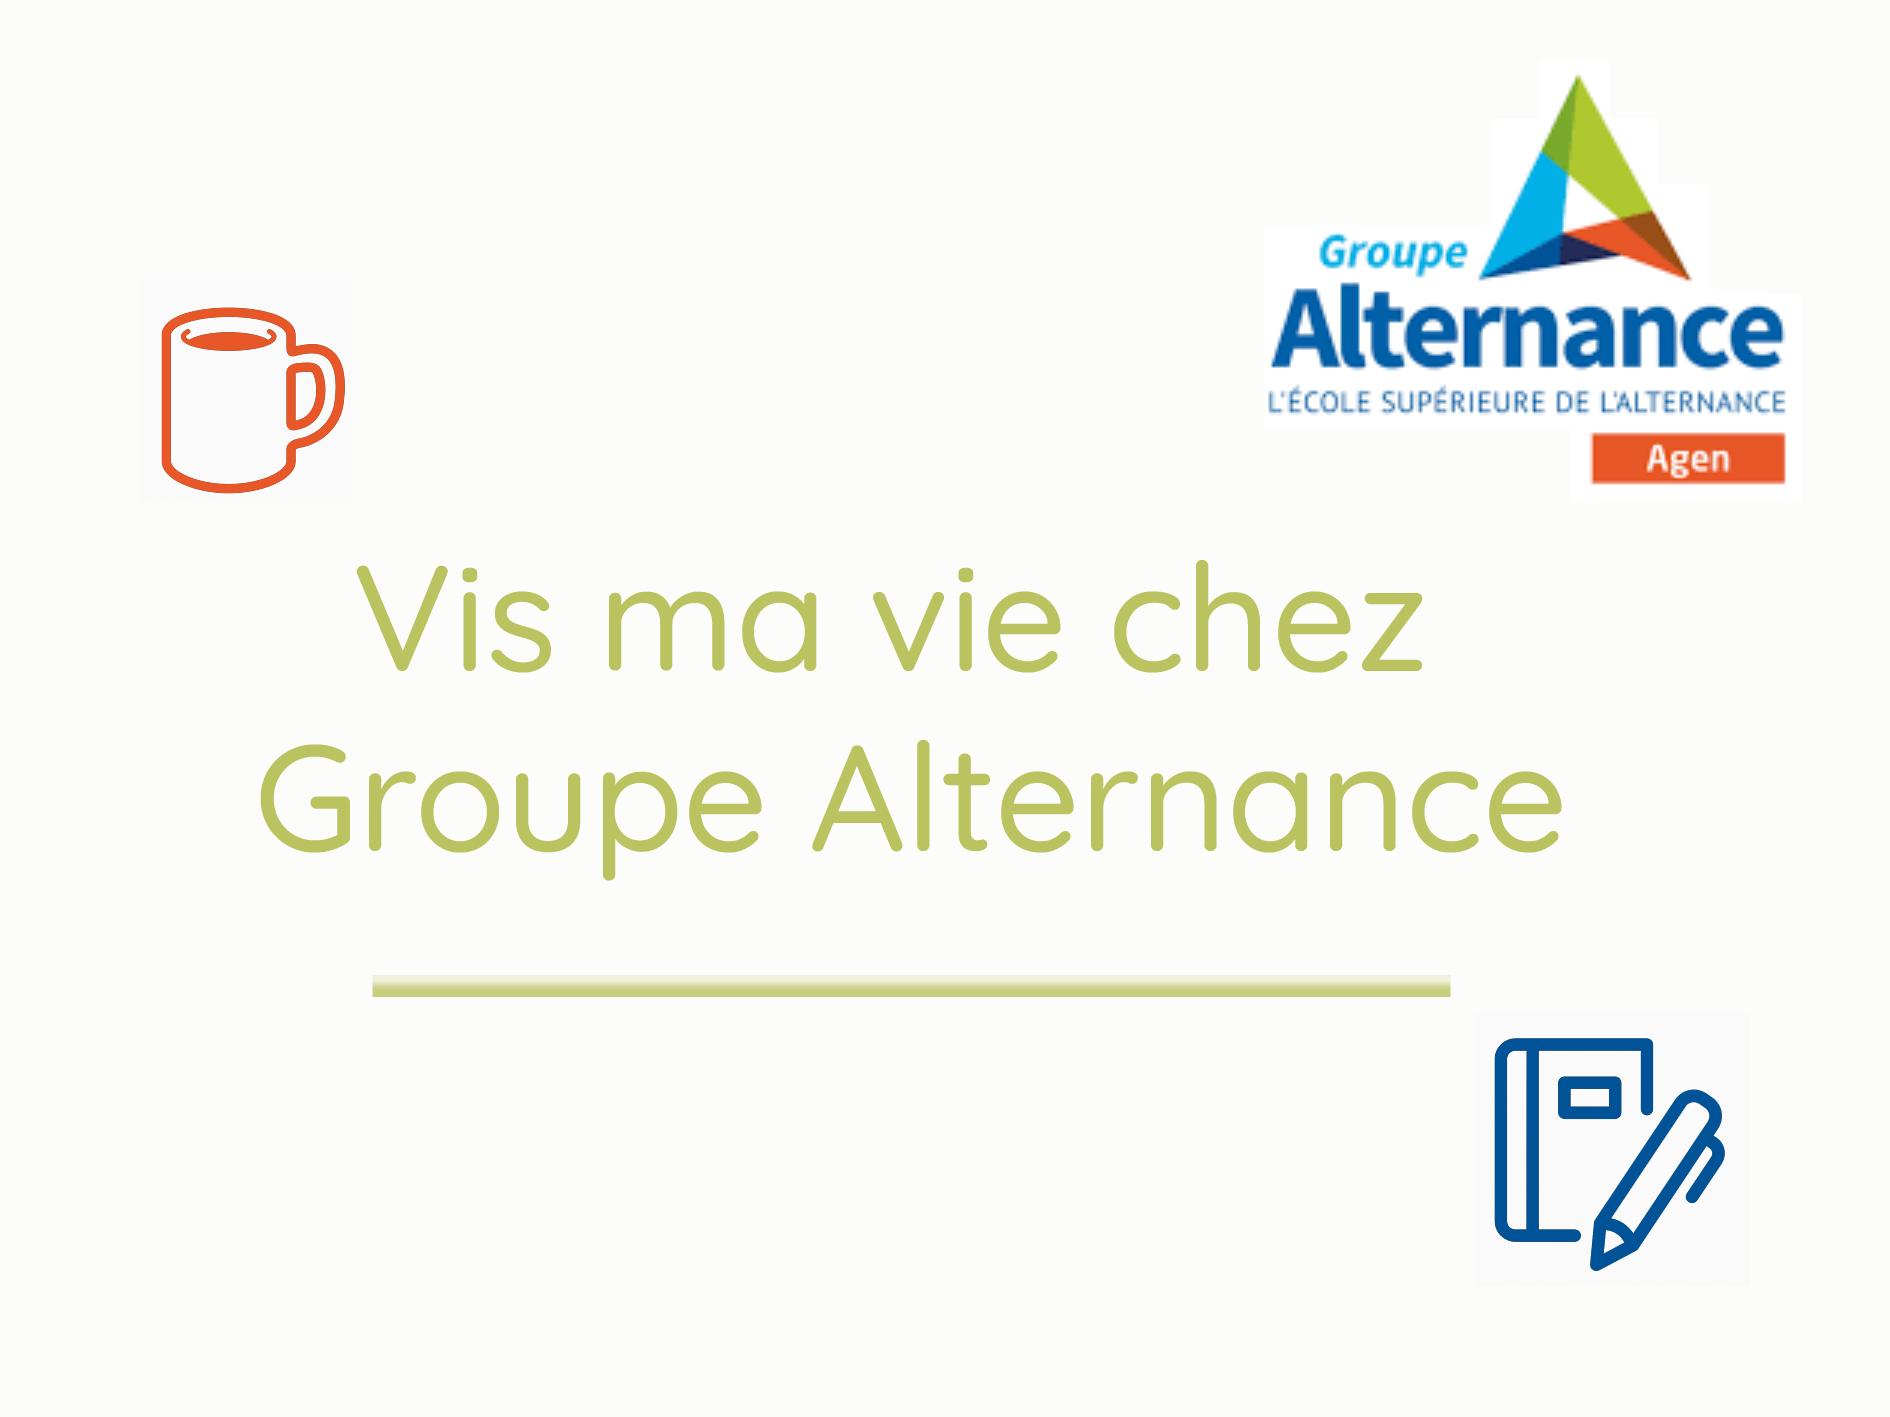 Groupe Alternance Agen Garonne mini-série vidéos Facebook témoignage centre de formation